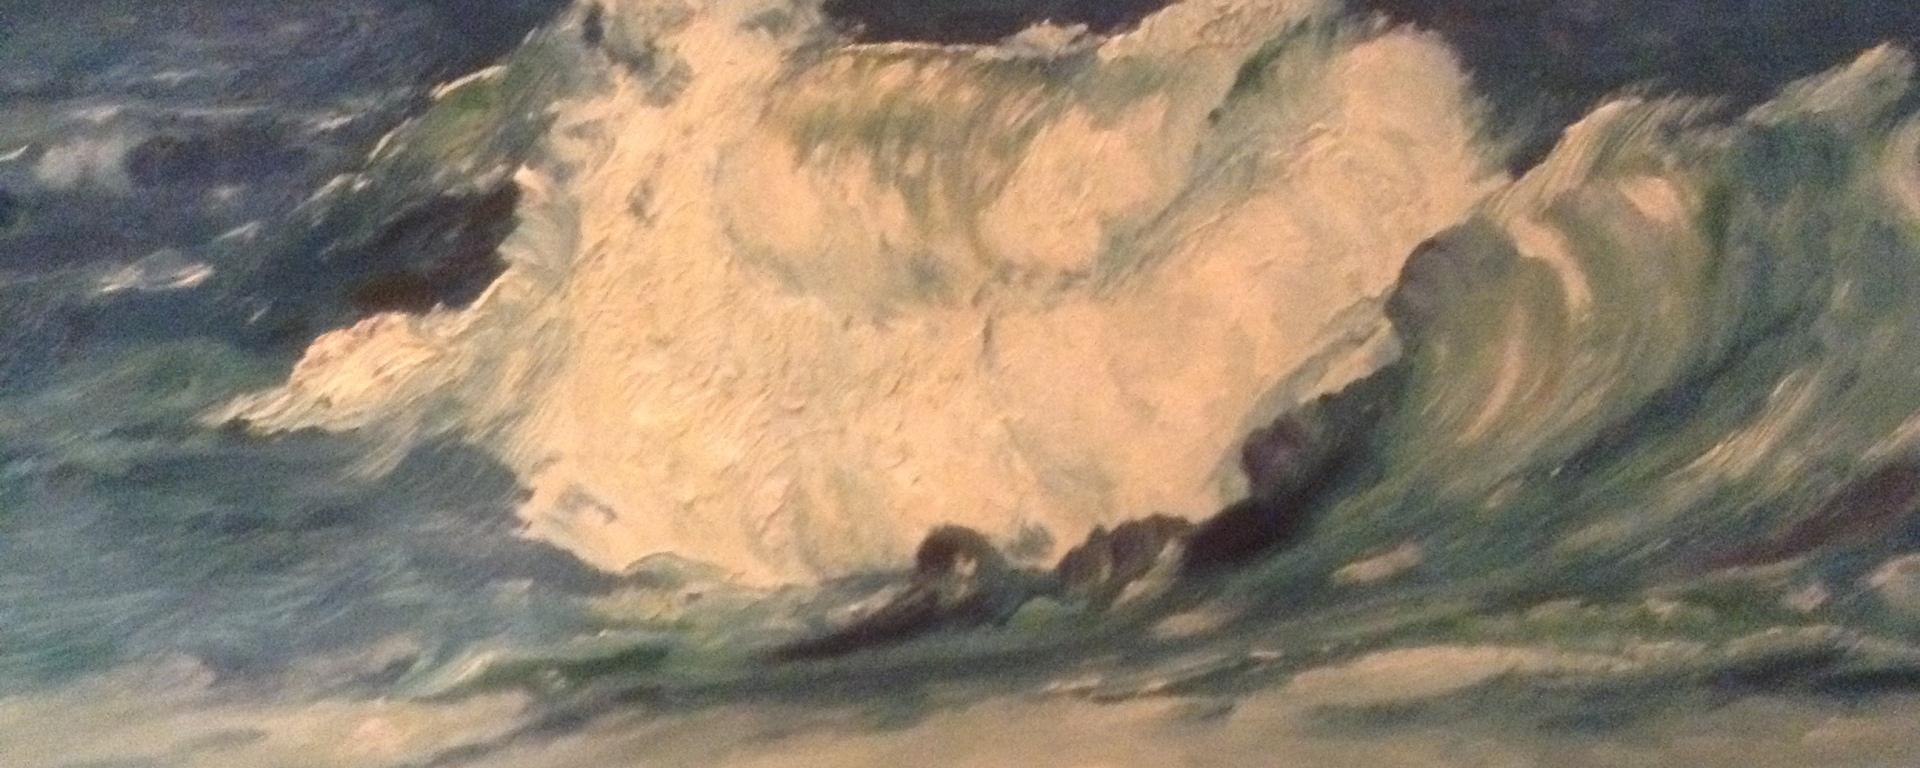 wave crashing on north norfolk coast 3 rocks